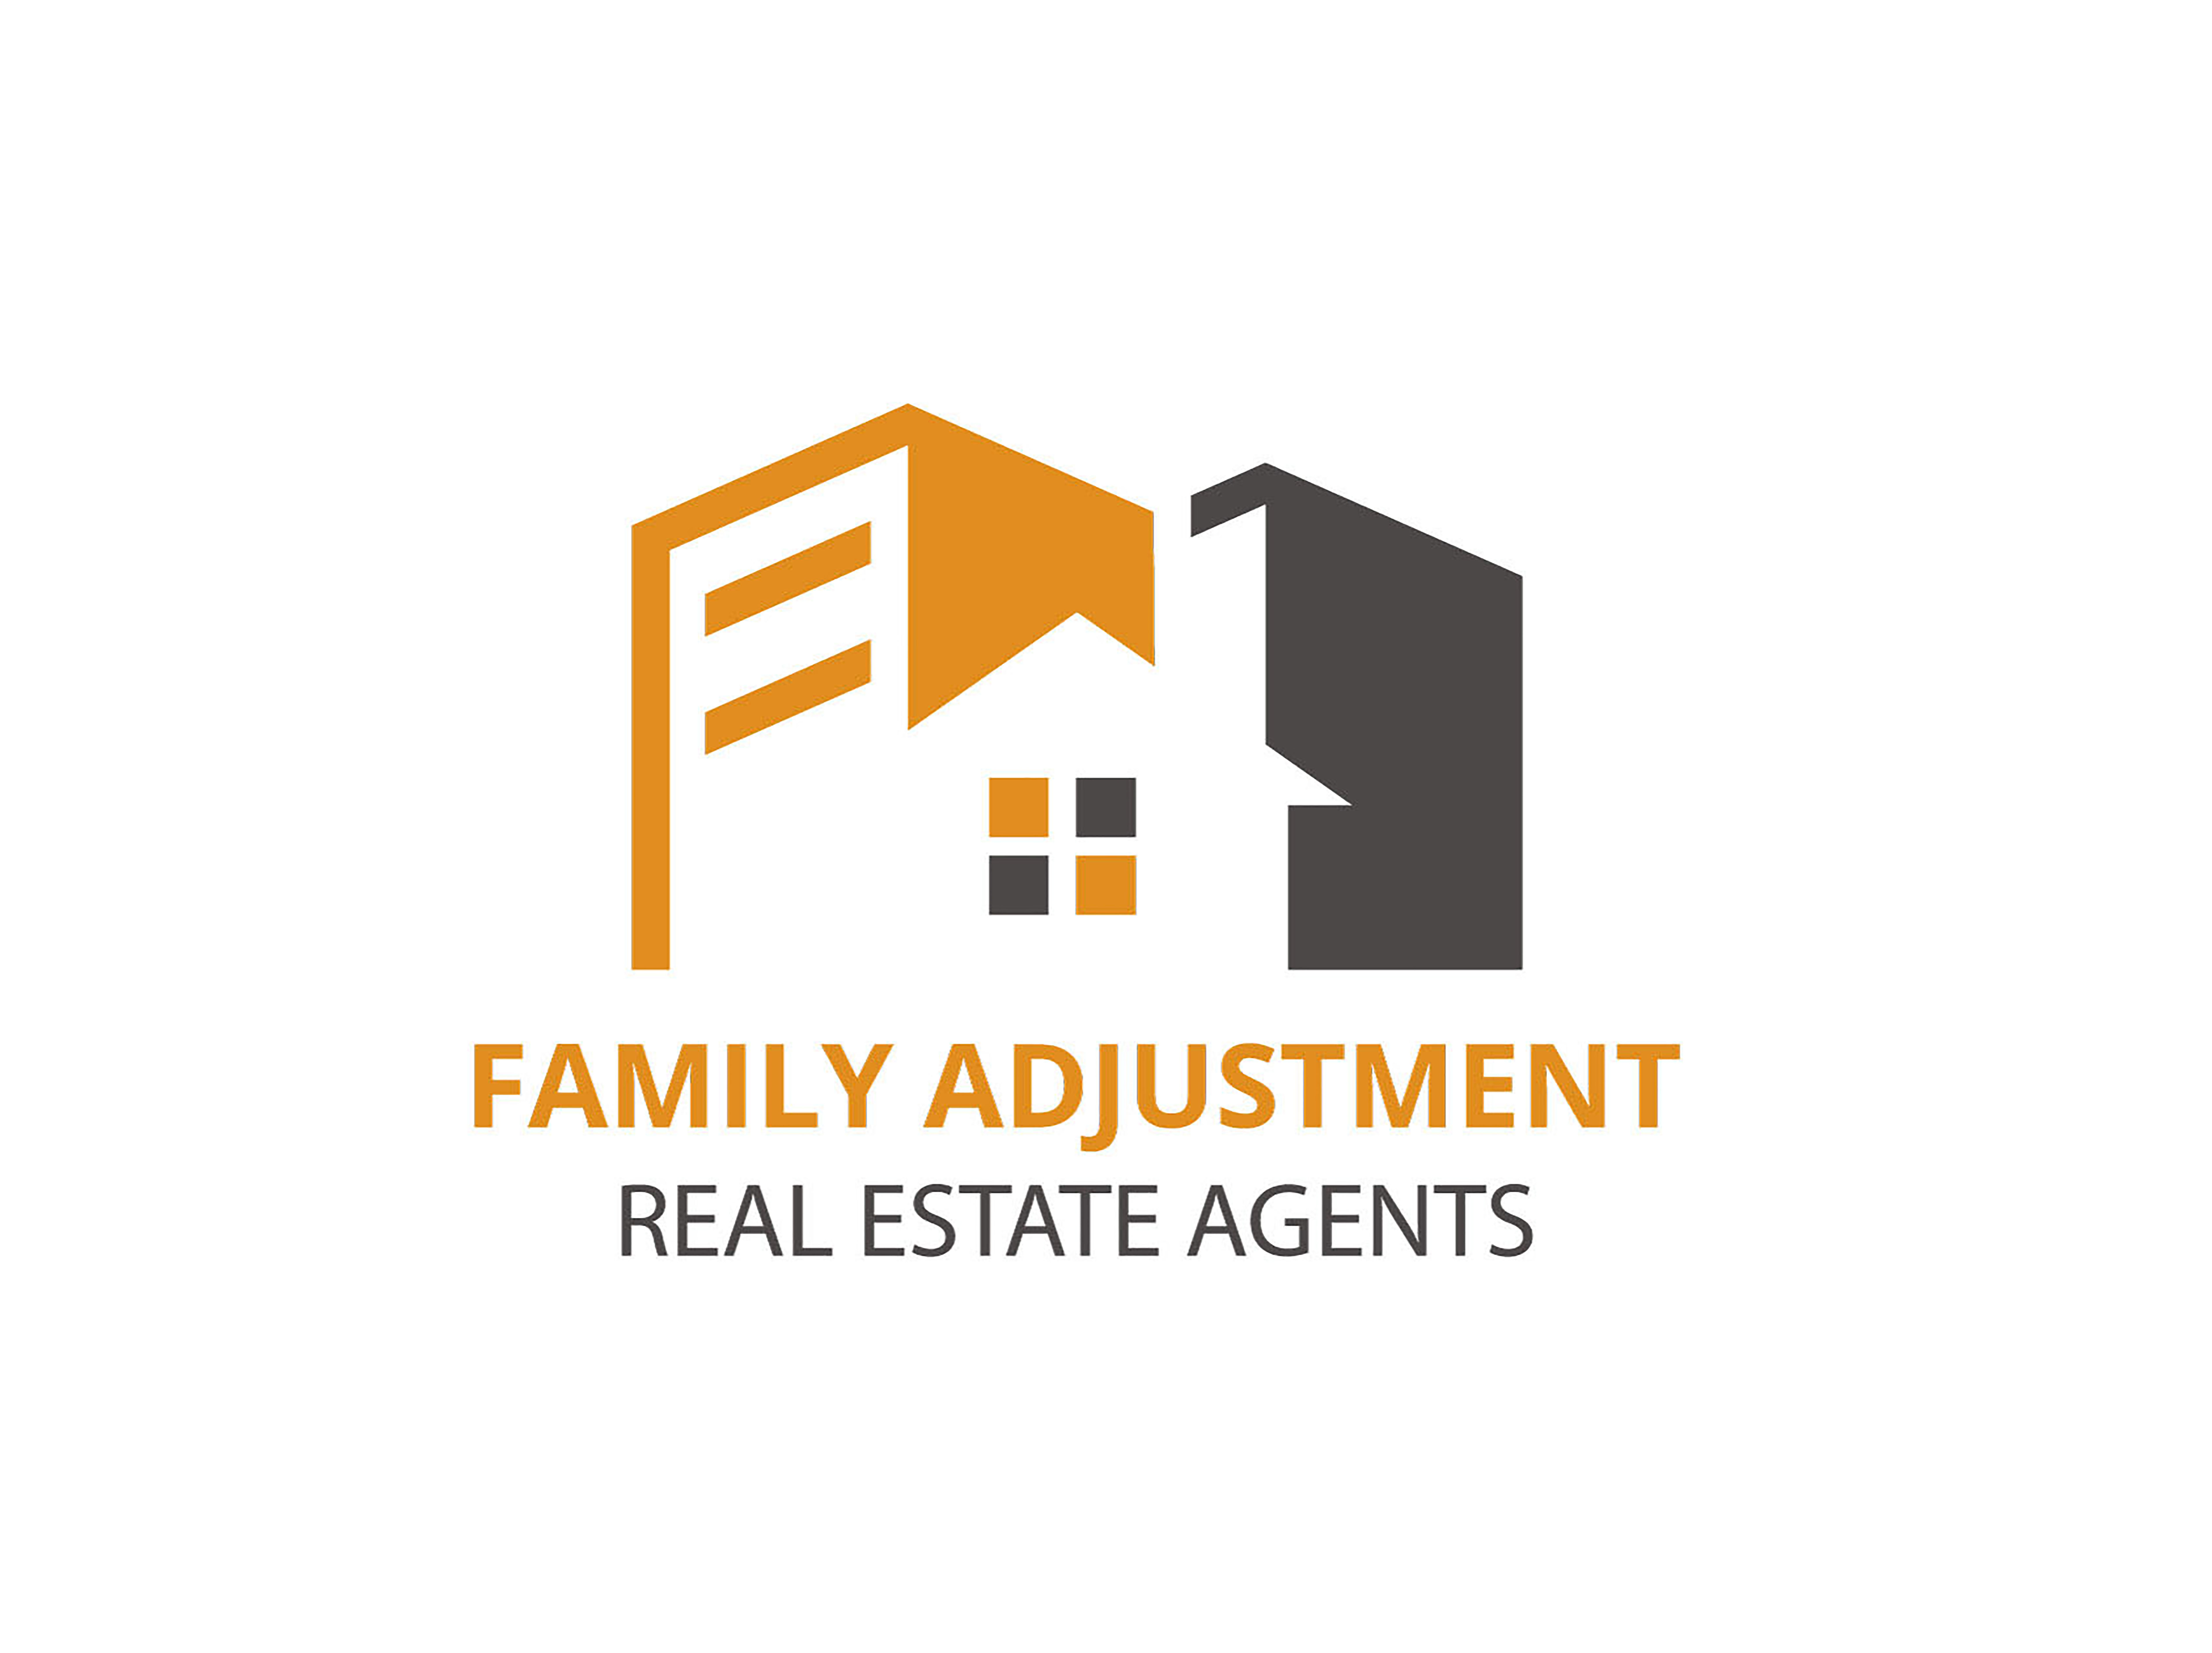 Do real estate logo design,construction,property,agency,home based logo design